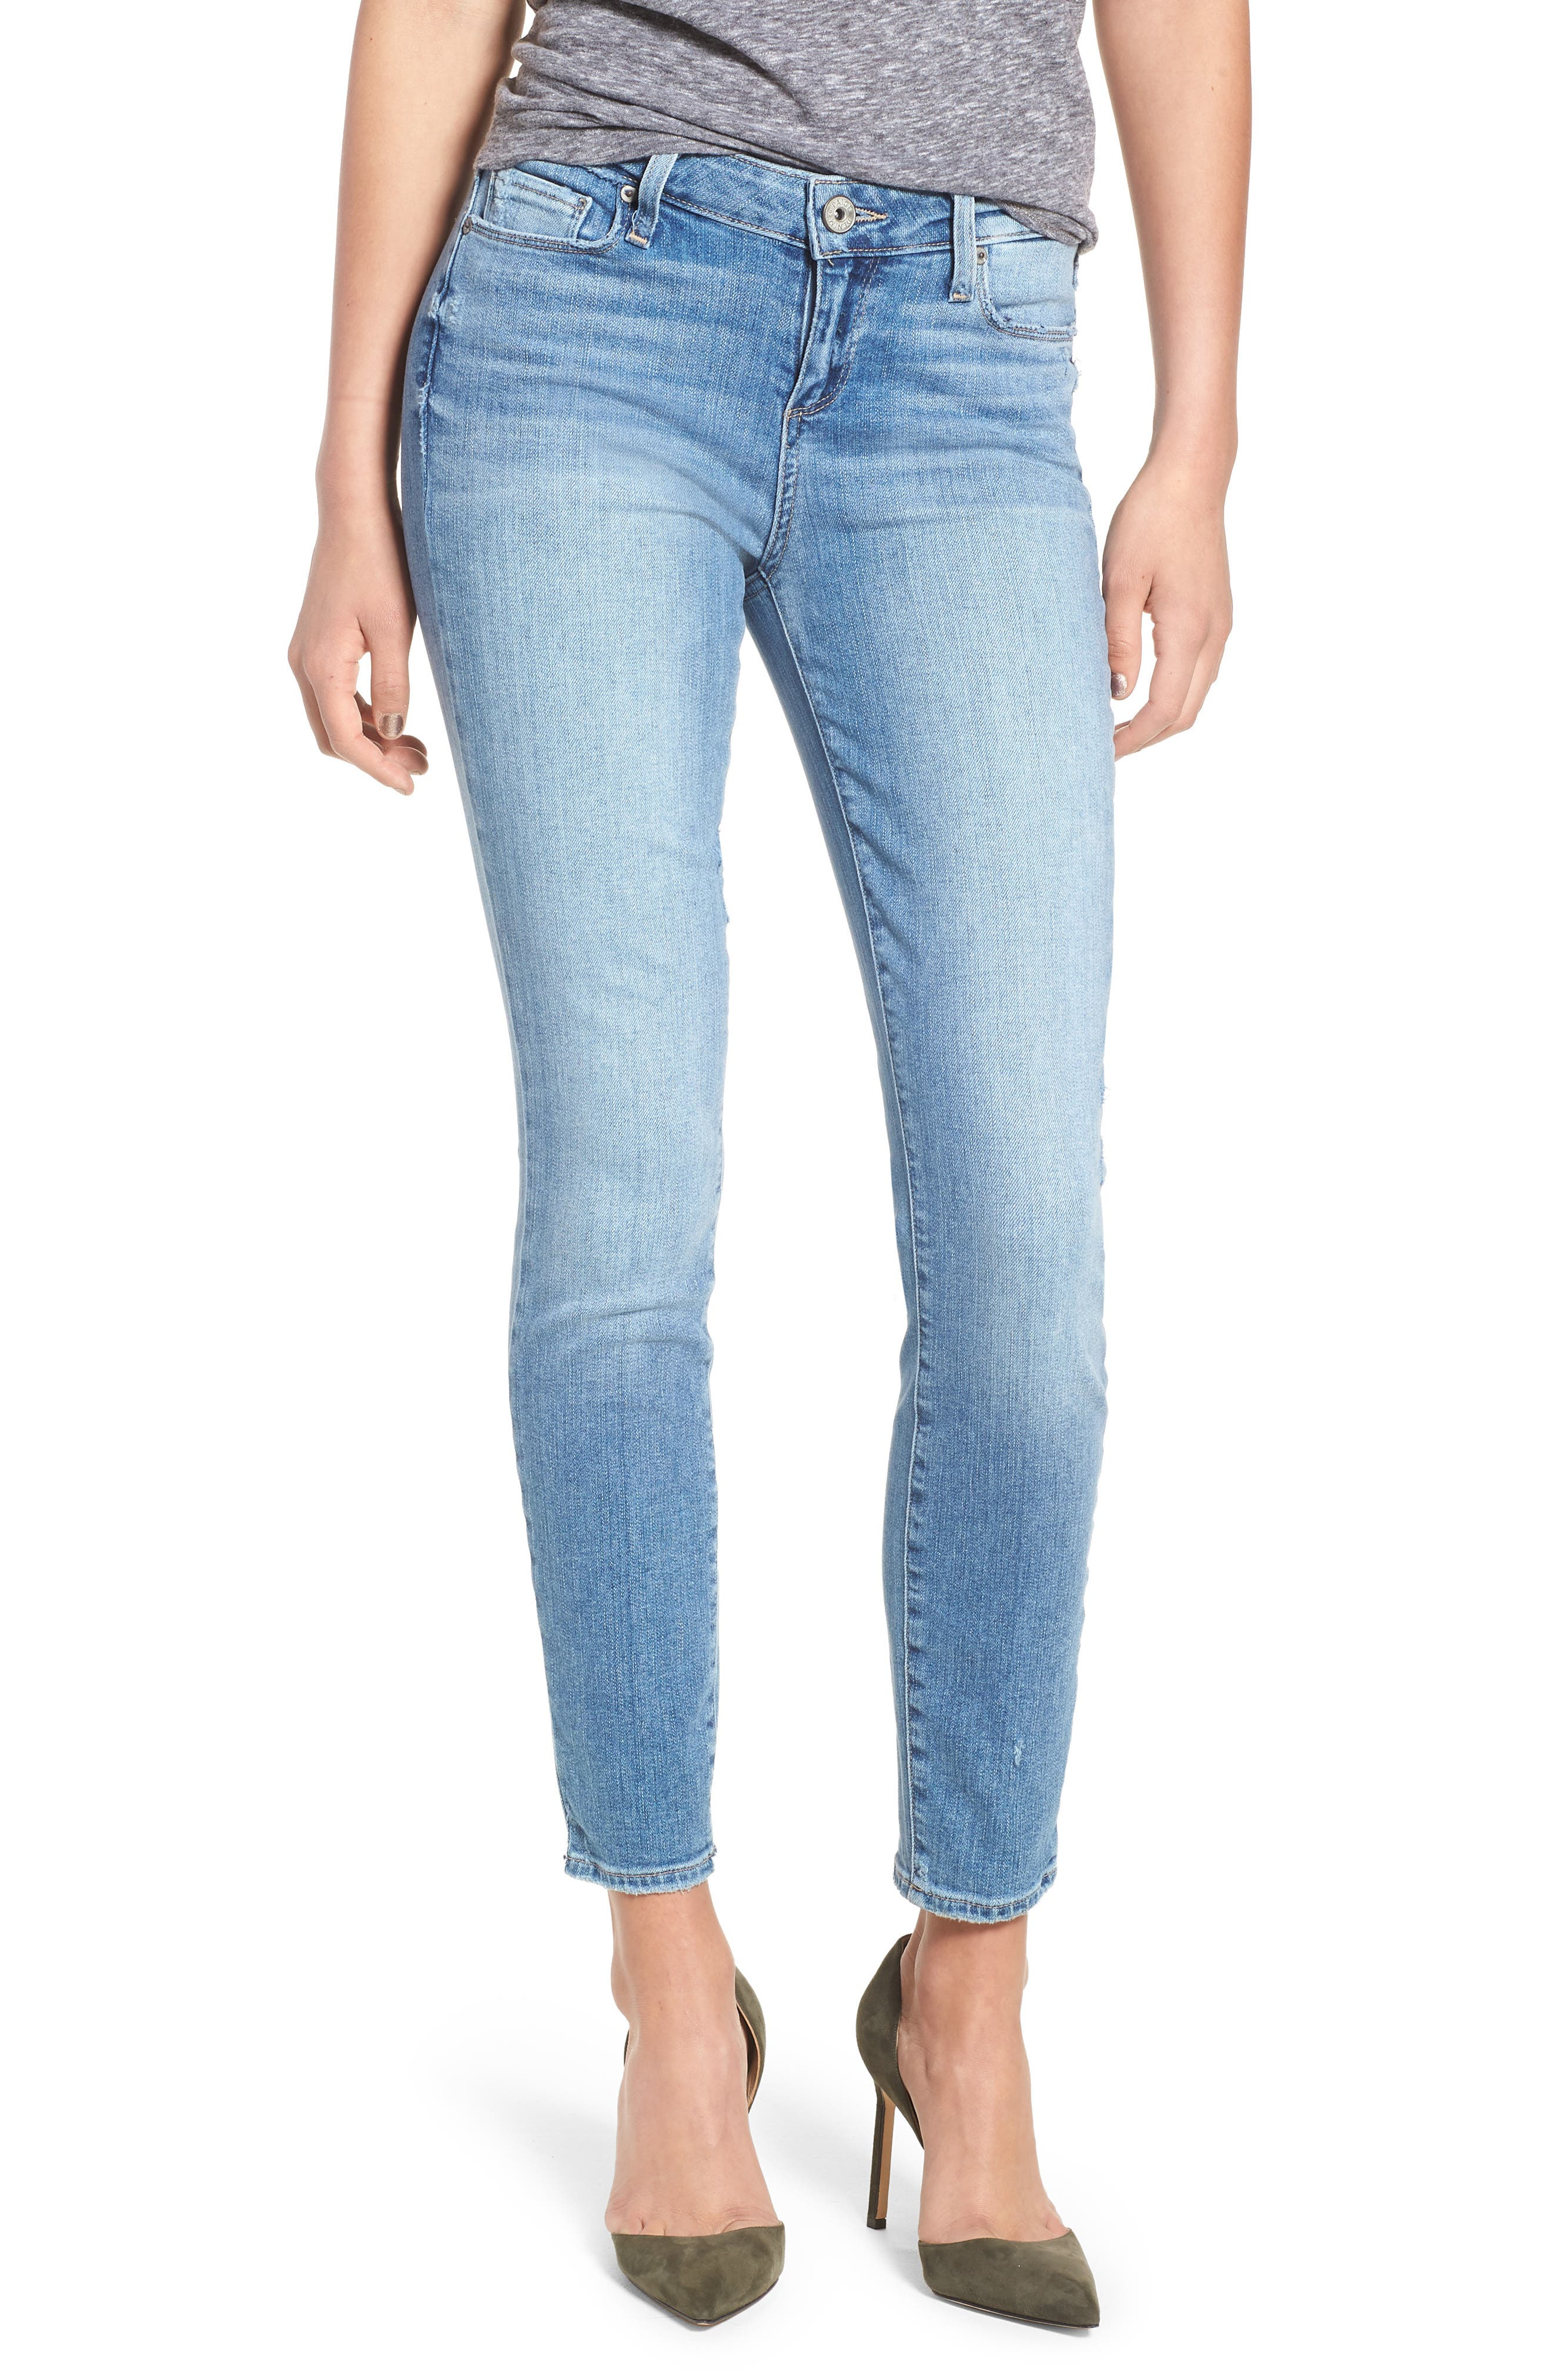 Transcend - Verdugo Ankle Ultra Skinny Jeans,                             Main thumbnail 1, color,                             Soto